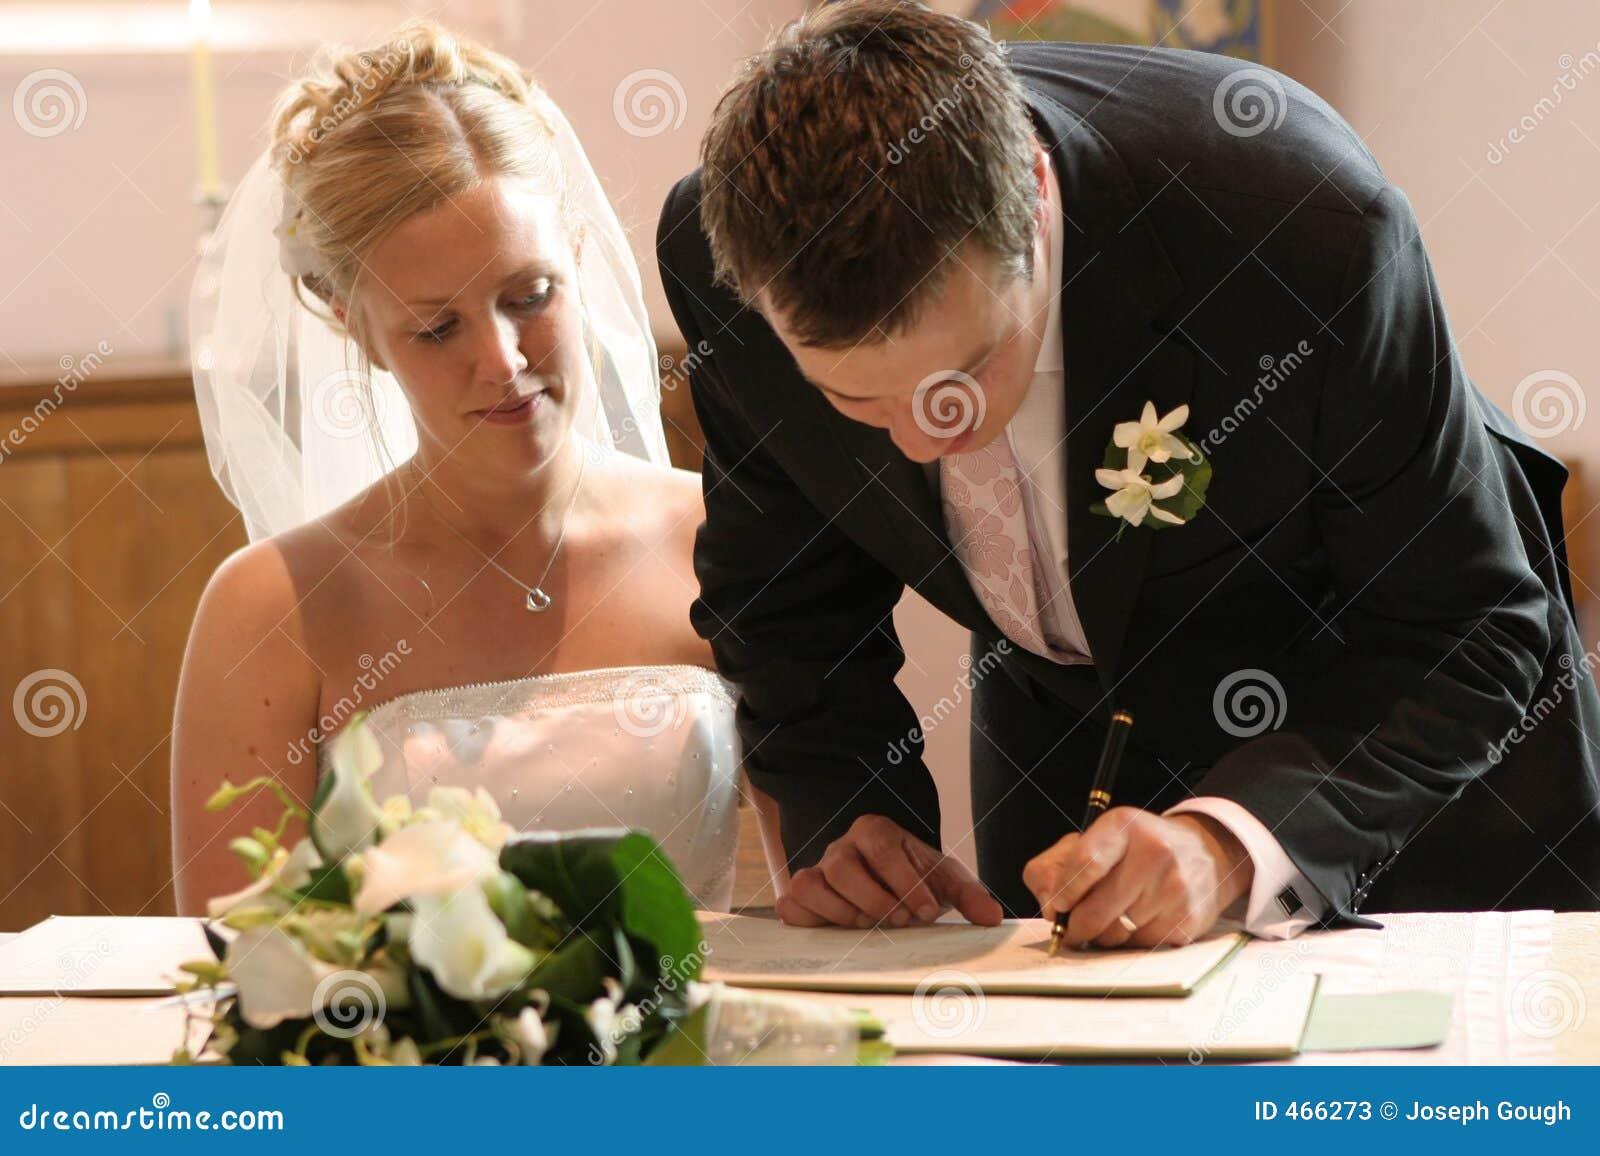 couple signing wedding marriage register stock image image of